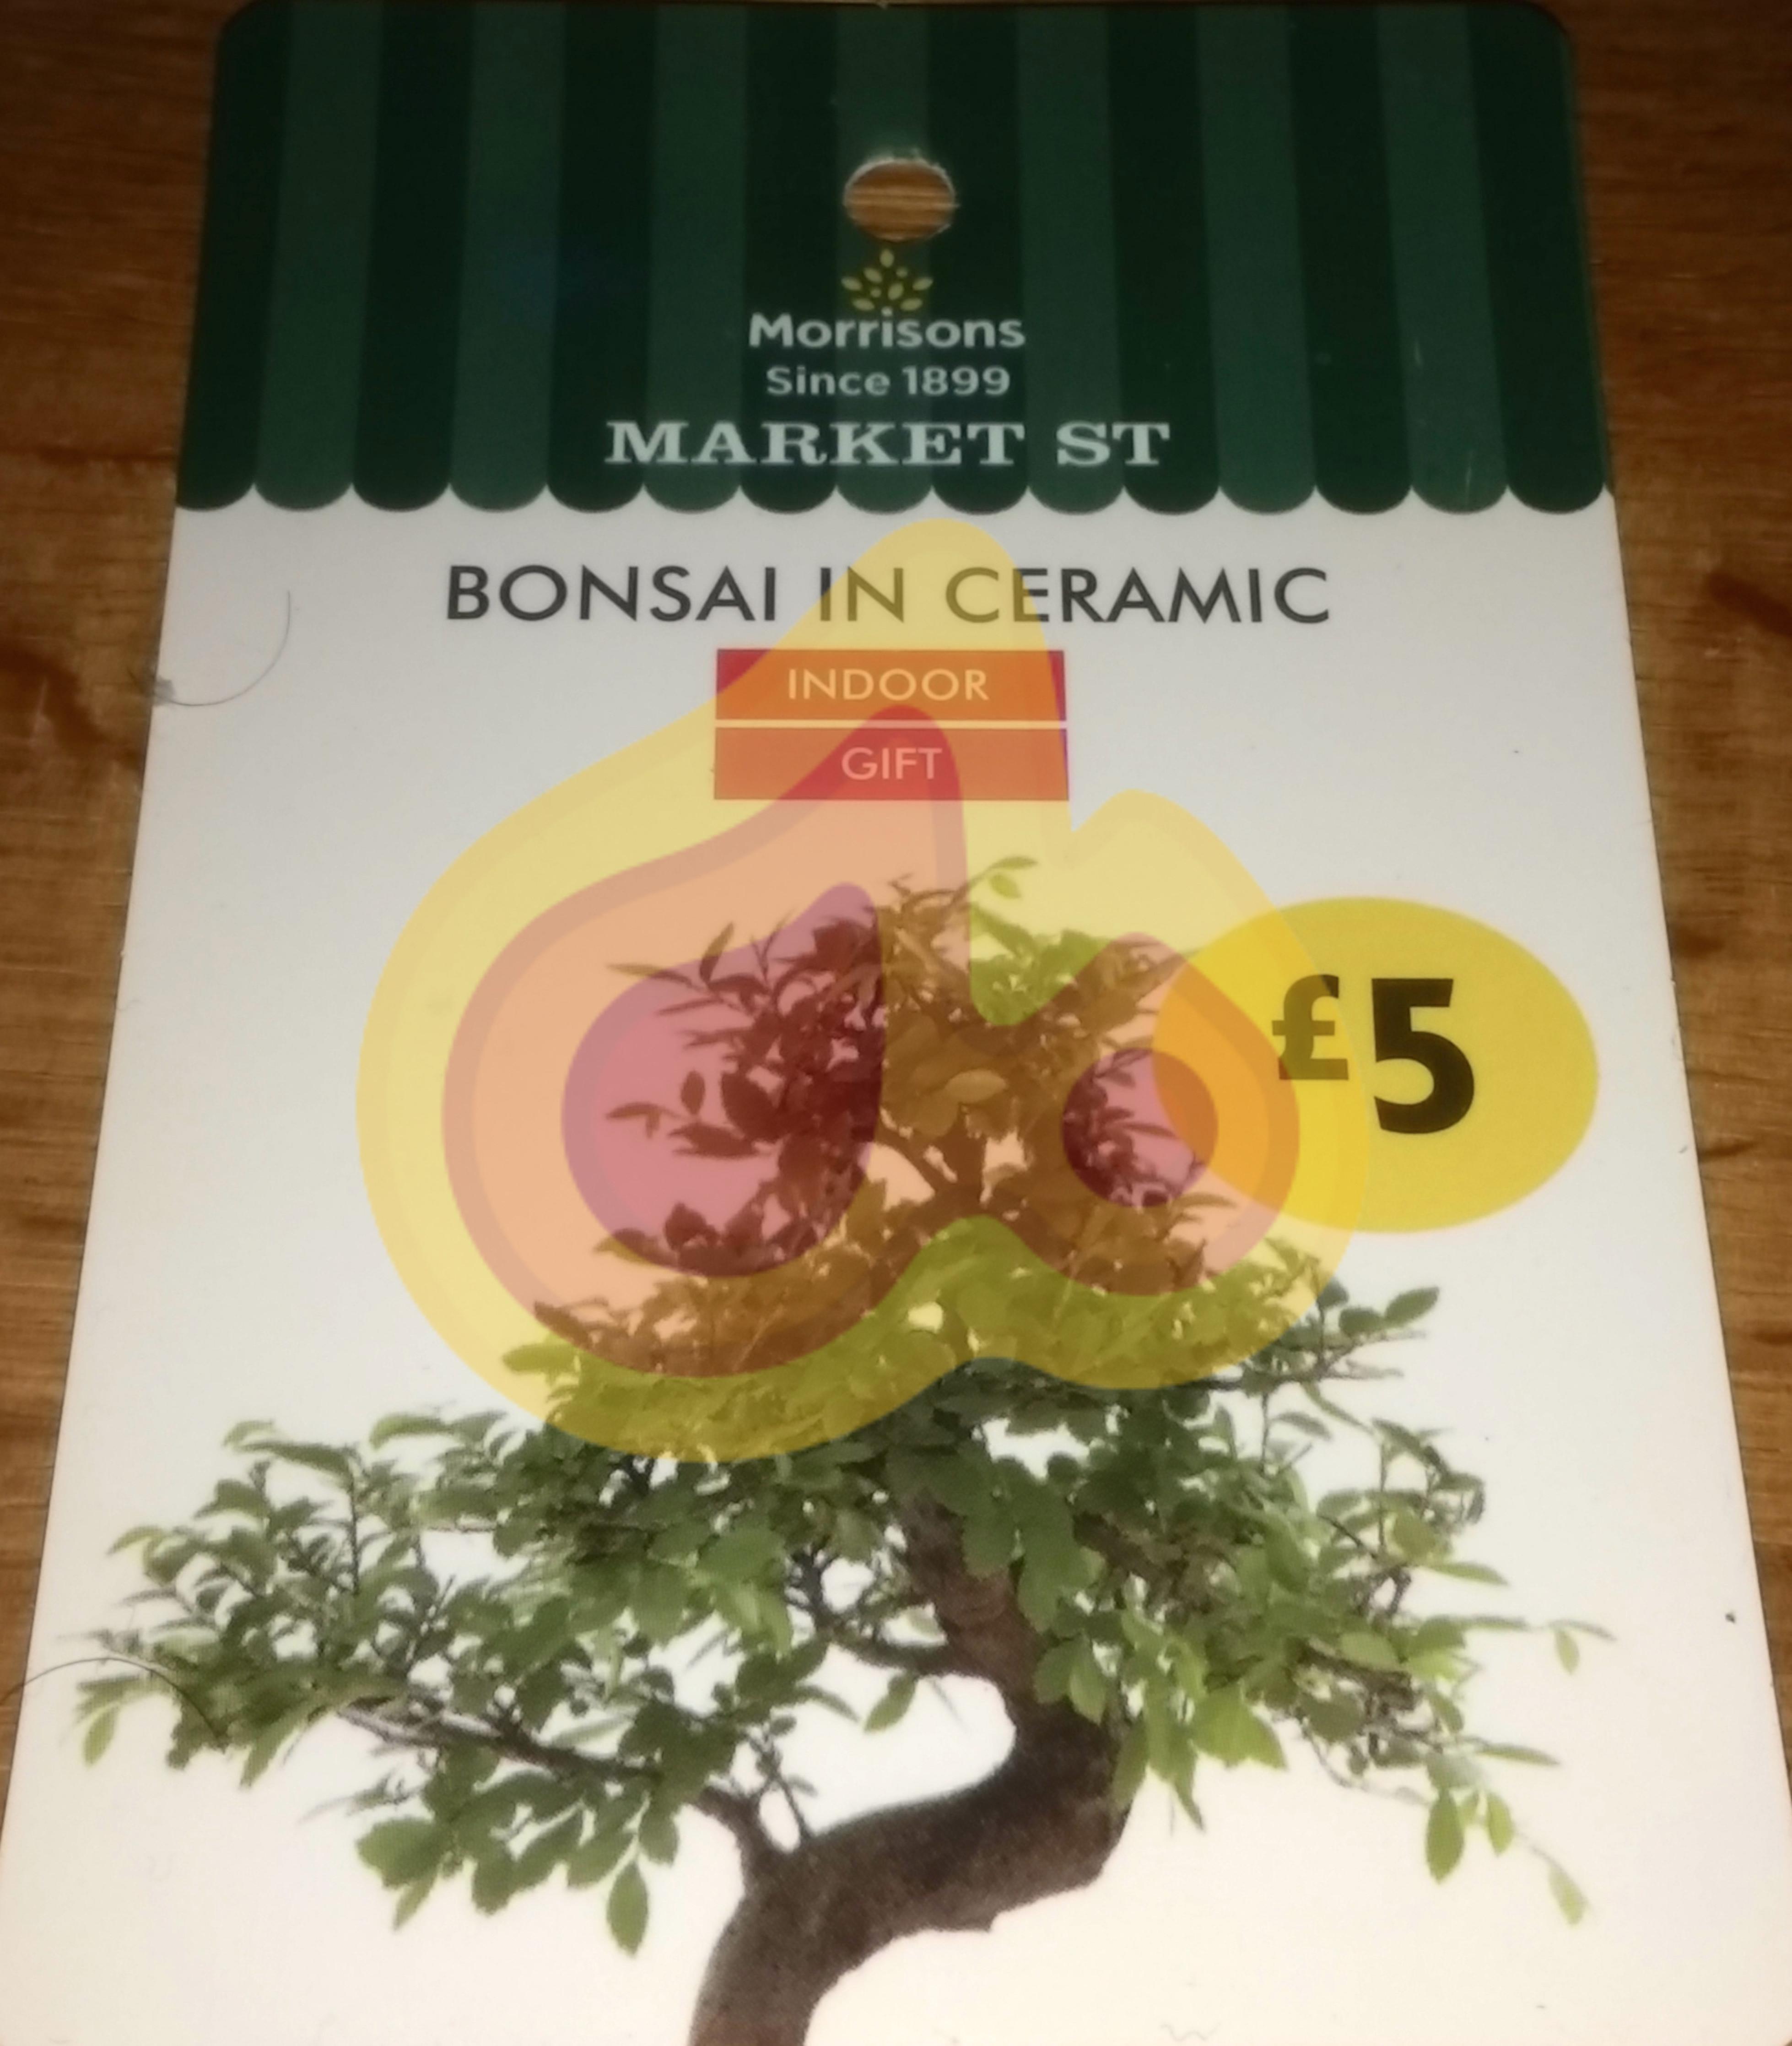 Bonsai Tree in Black or White Ceramic Pot £5 @ Morrisons instore